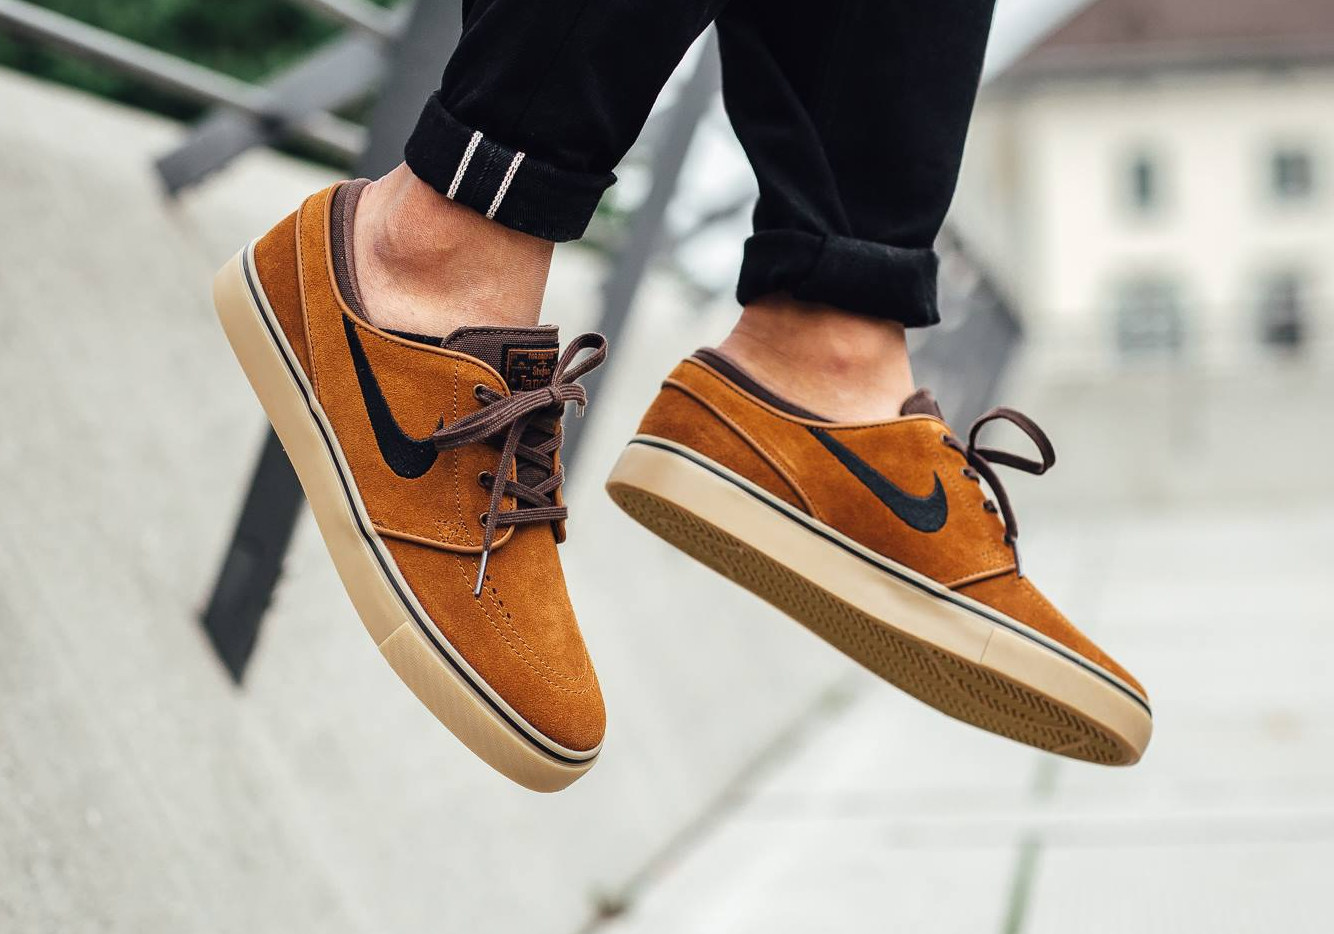 chaussure-nike-sb-janoski-daim-marron-2